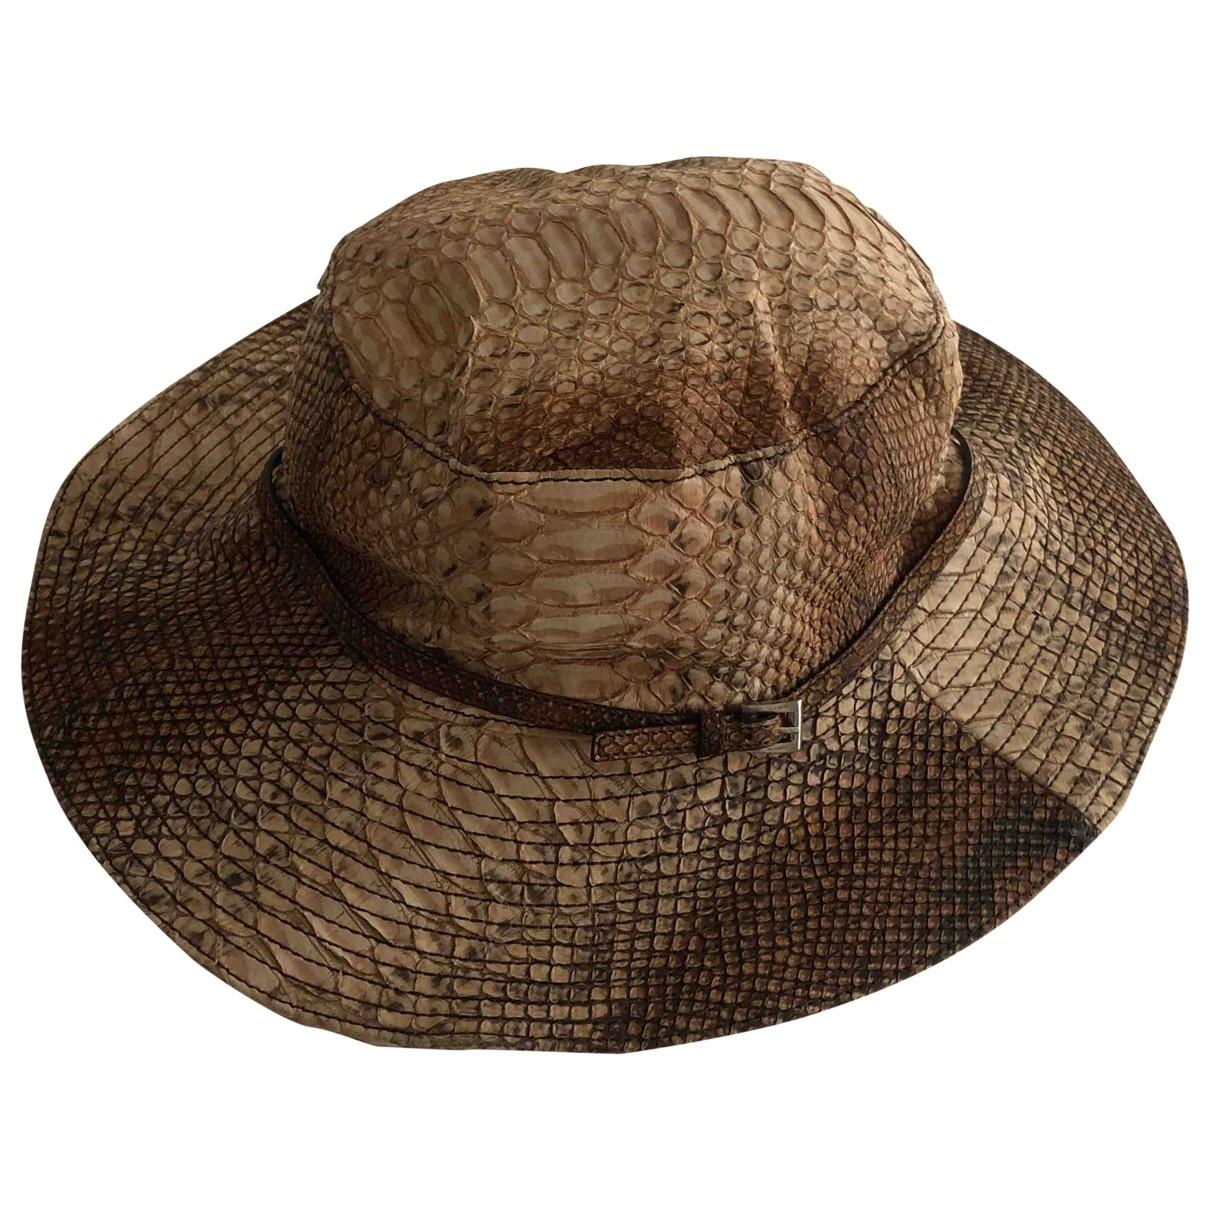 Prada \N Beige Leather hat for Women S International